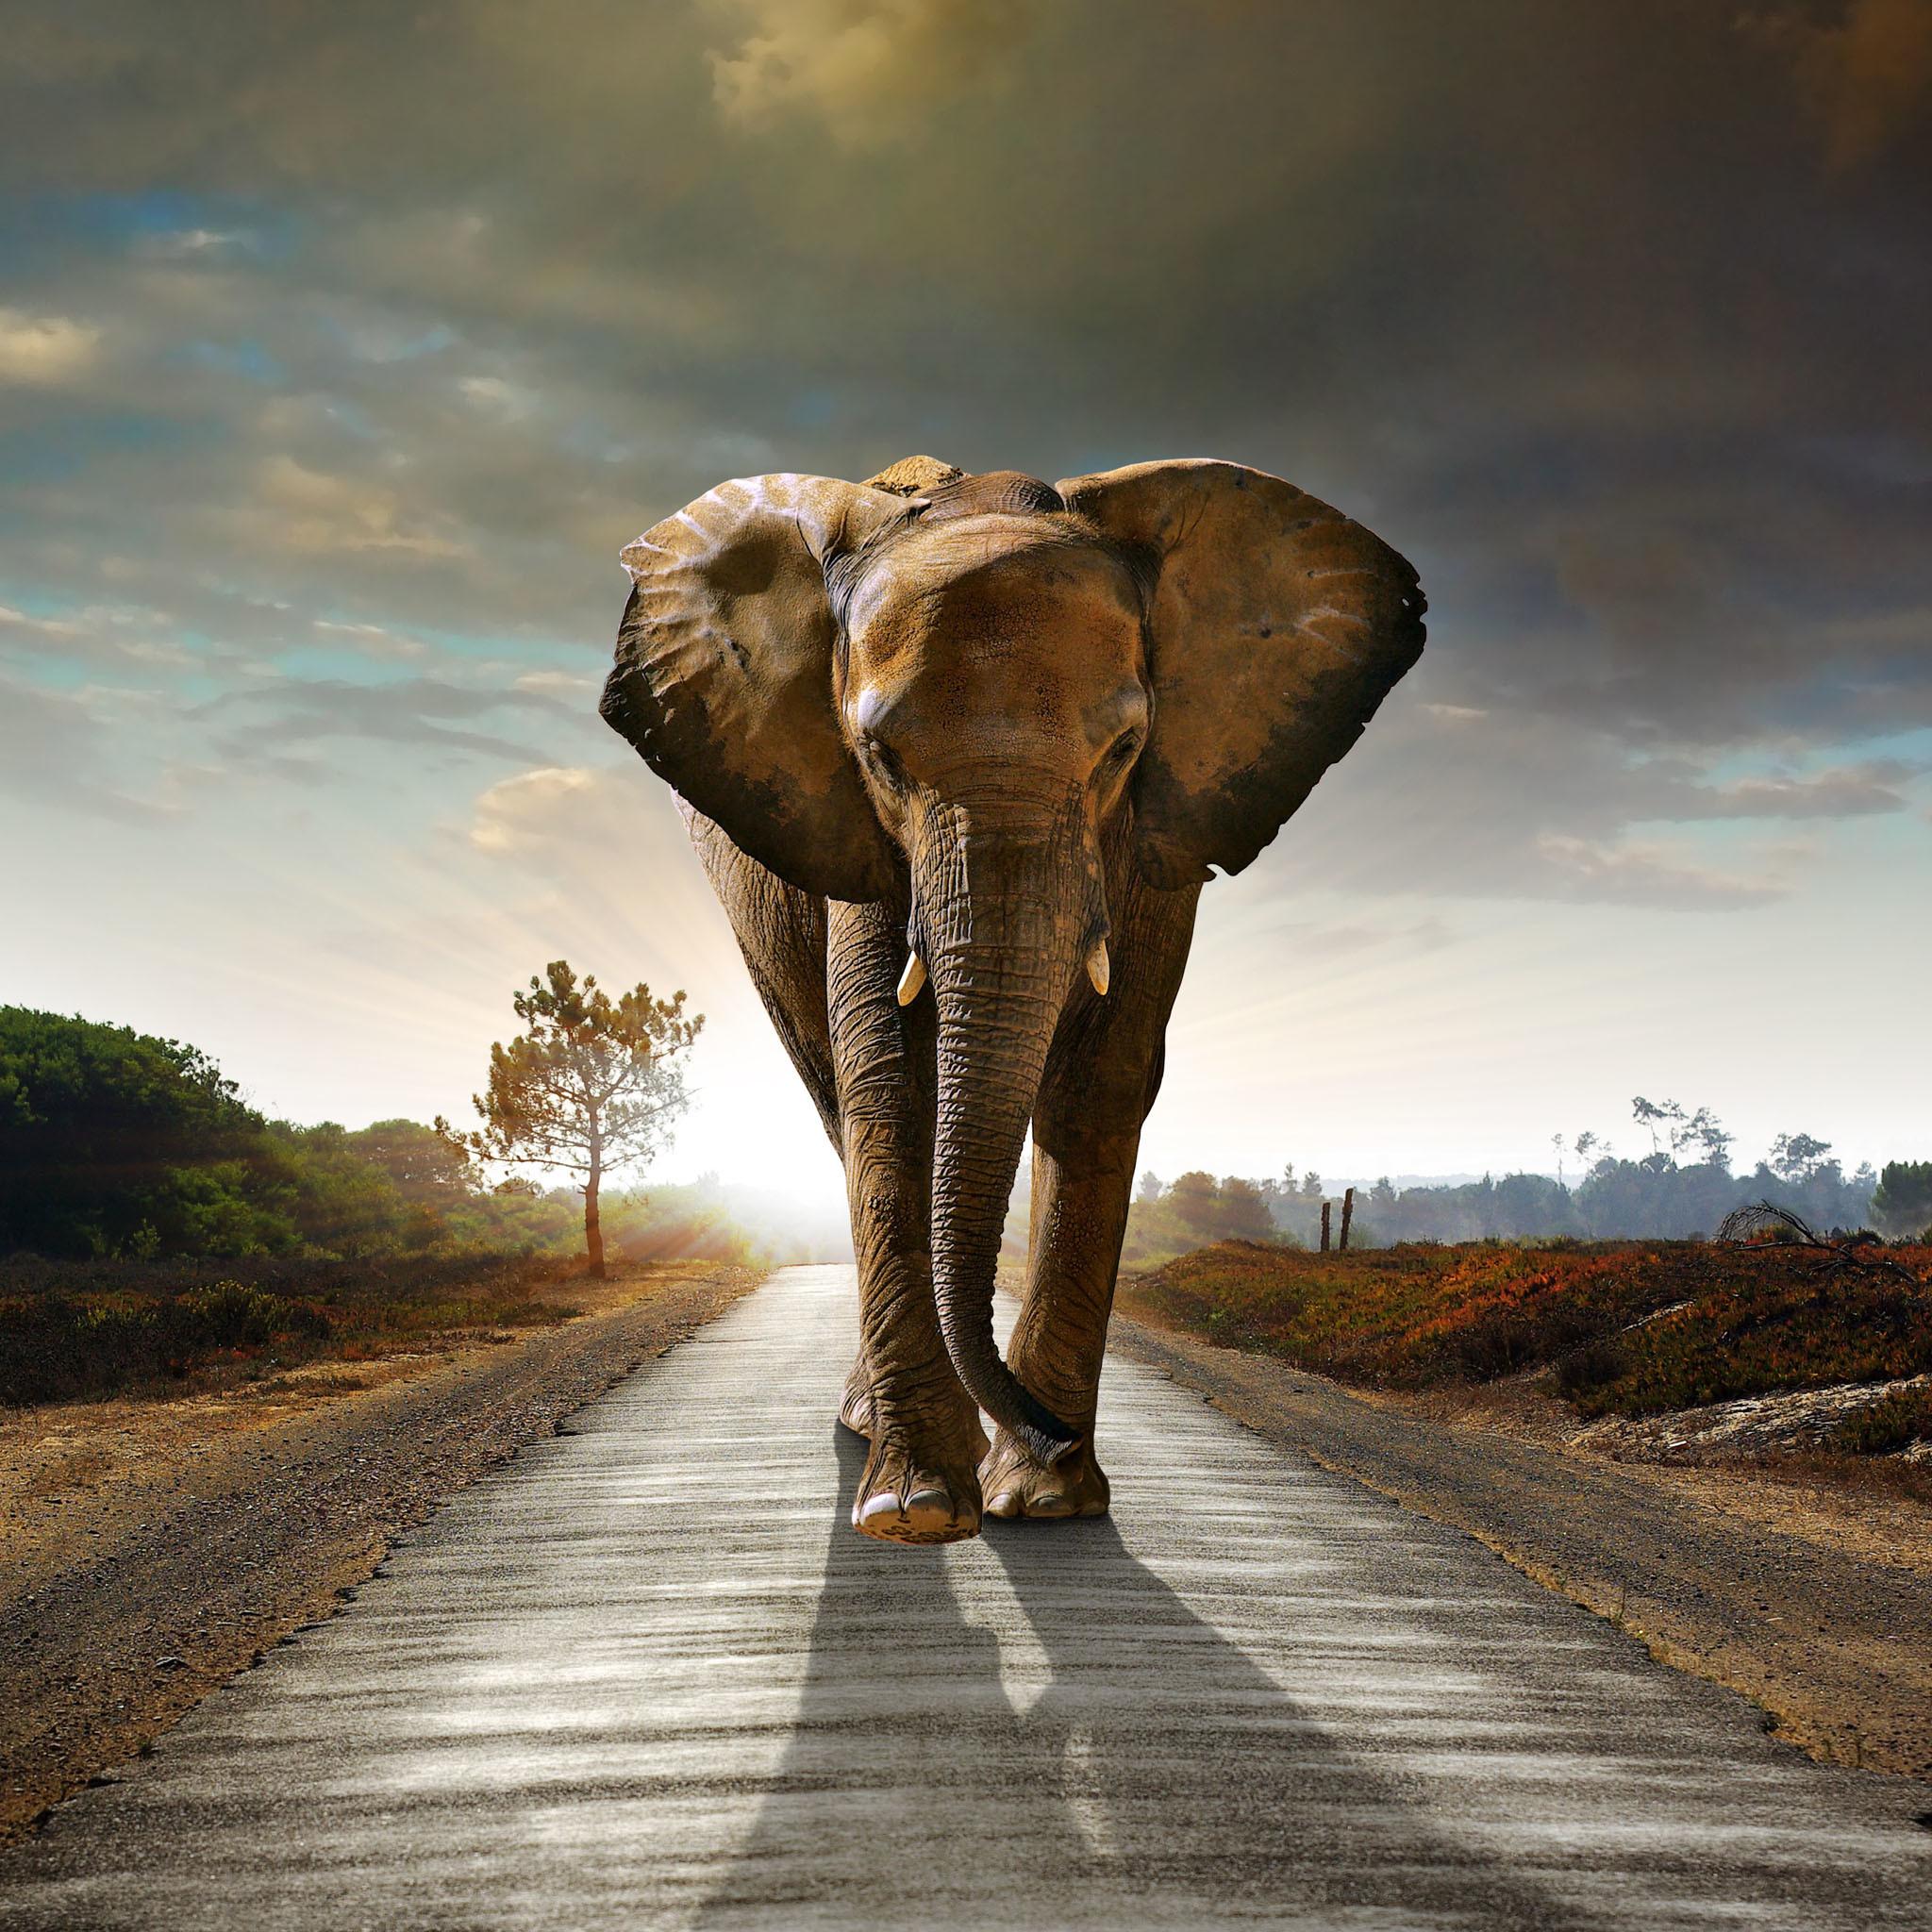 Res: 2048x2048, Elephant HD Wallpapers Desktop Pictures